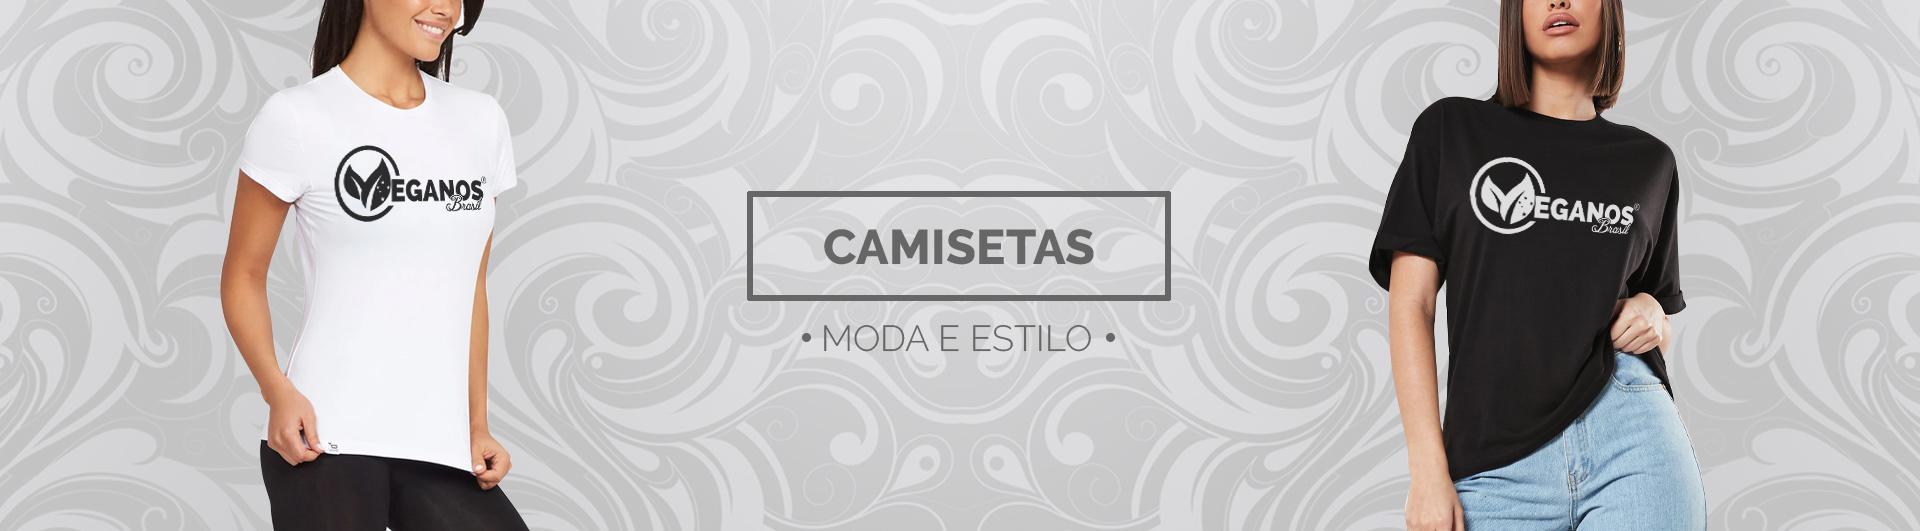 banner-pagina-loja2020